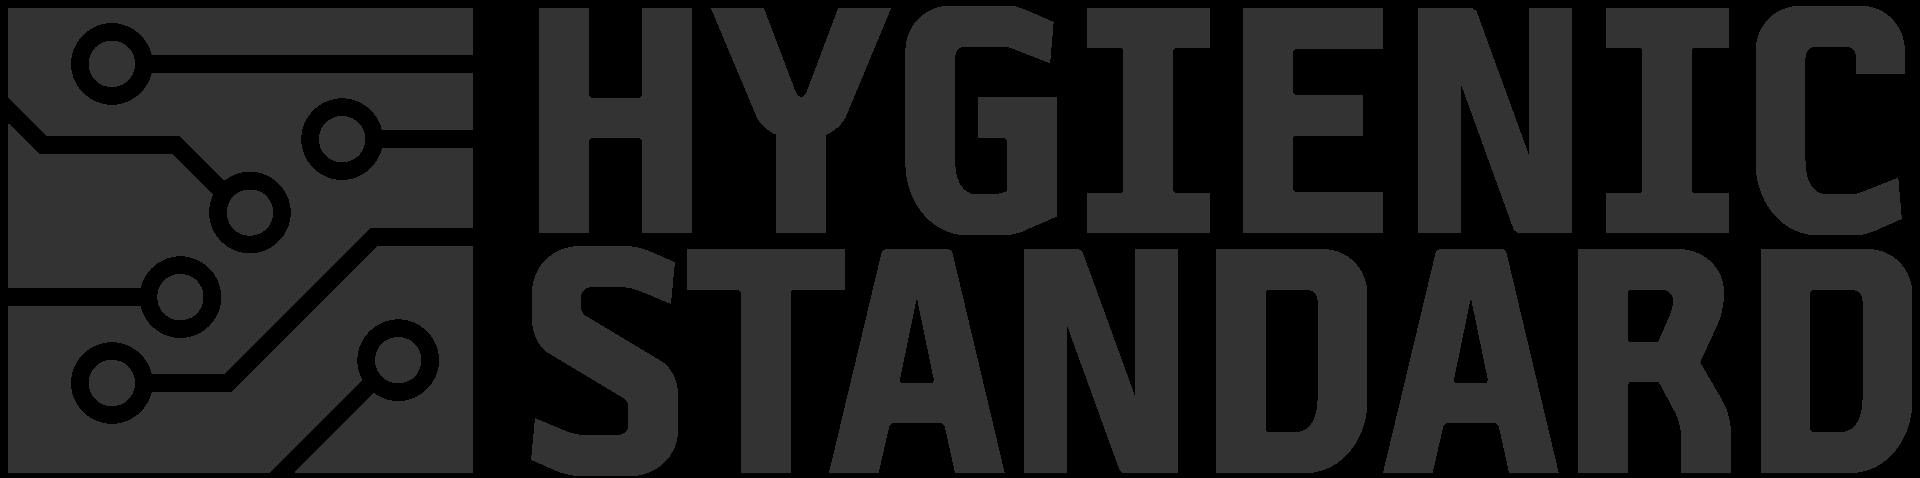 Hygienic Standard